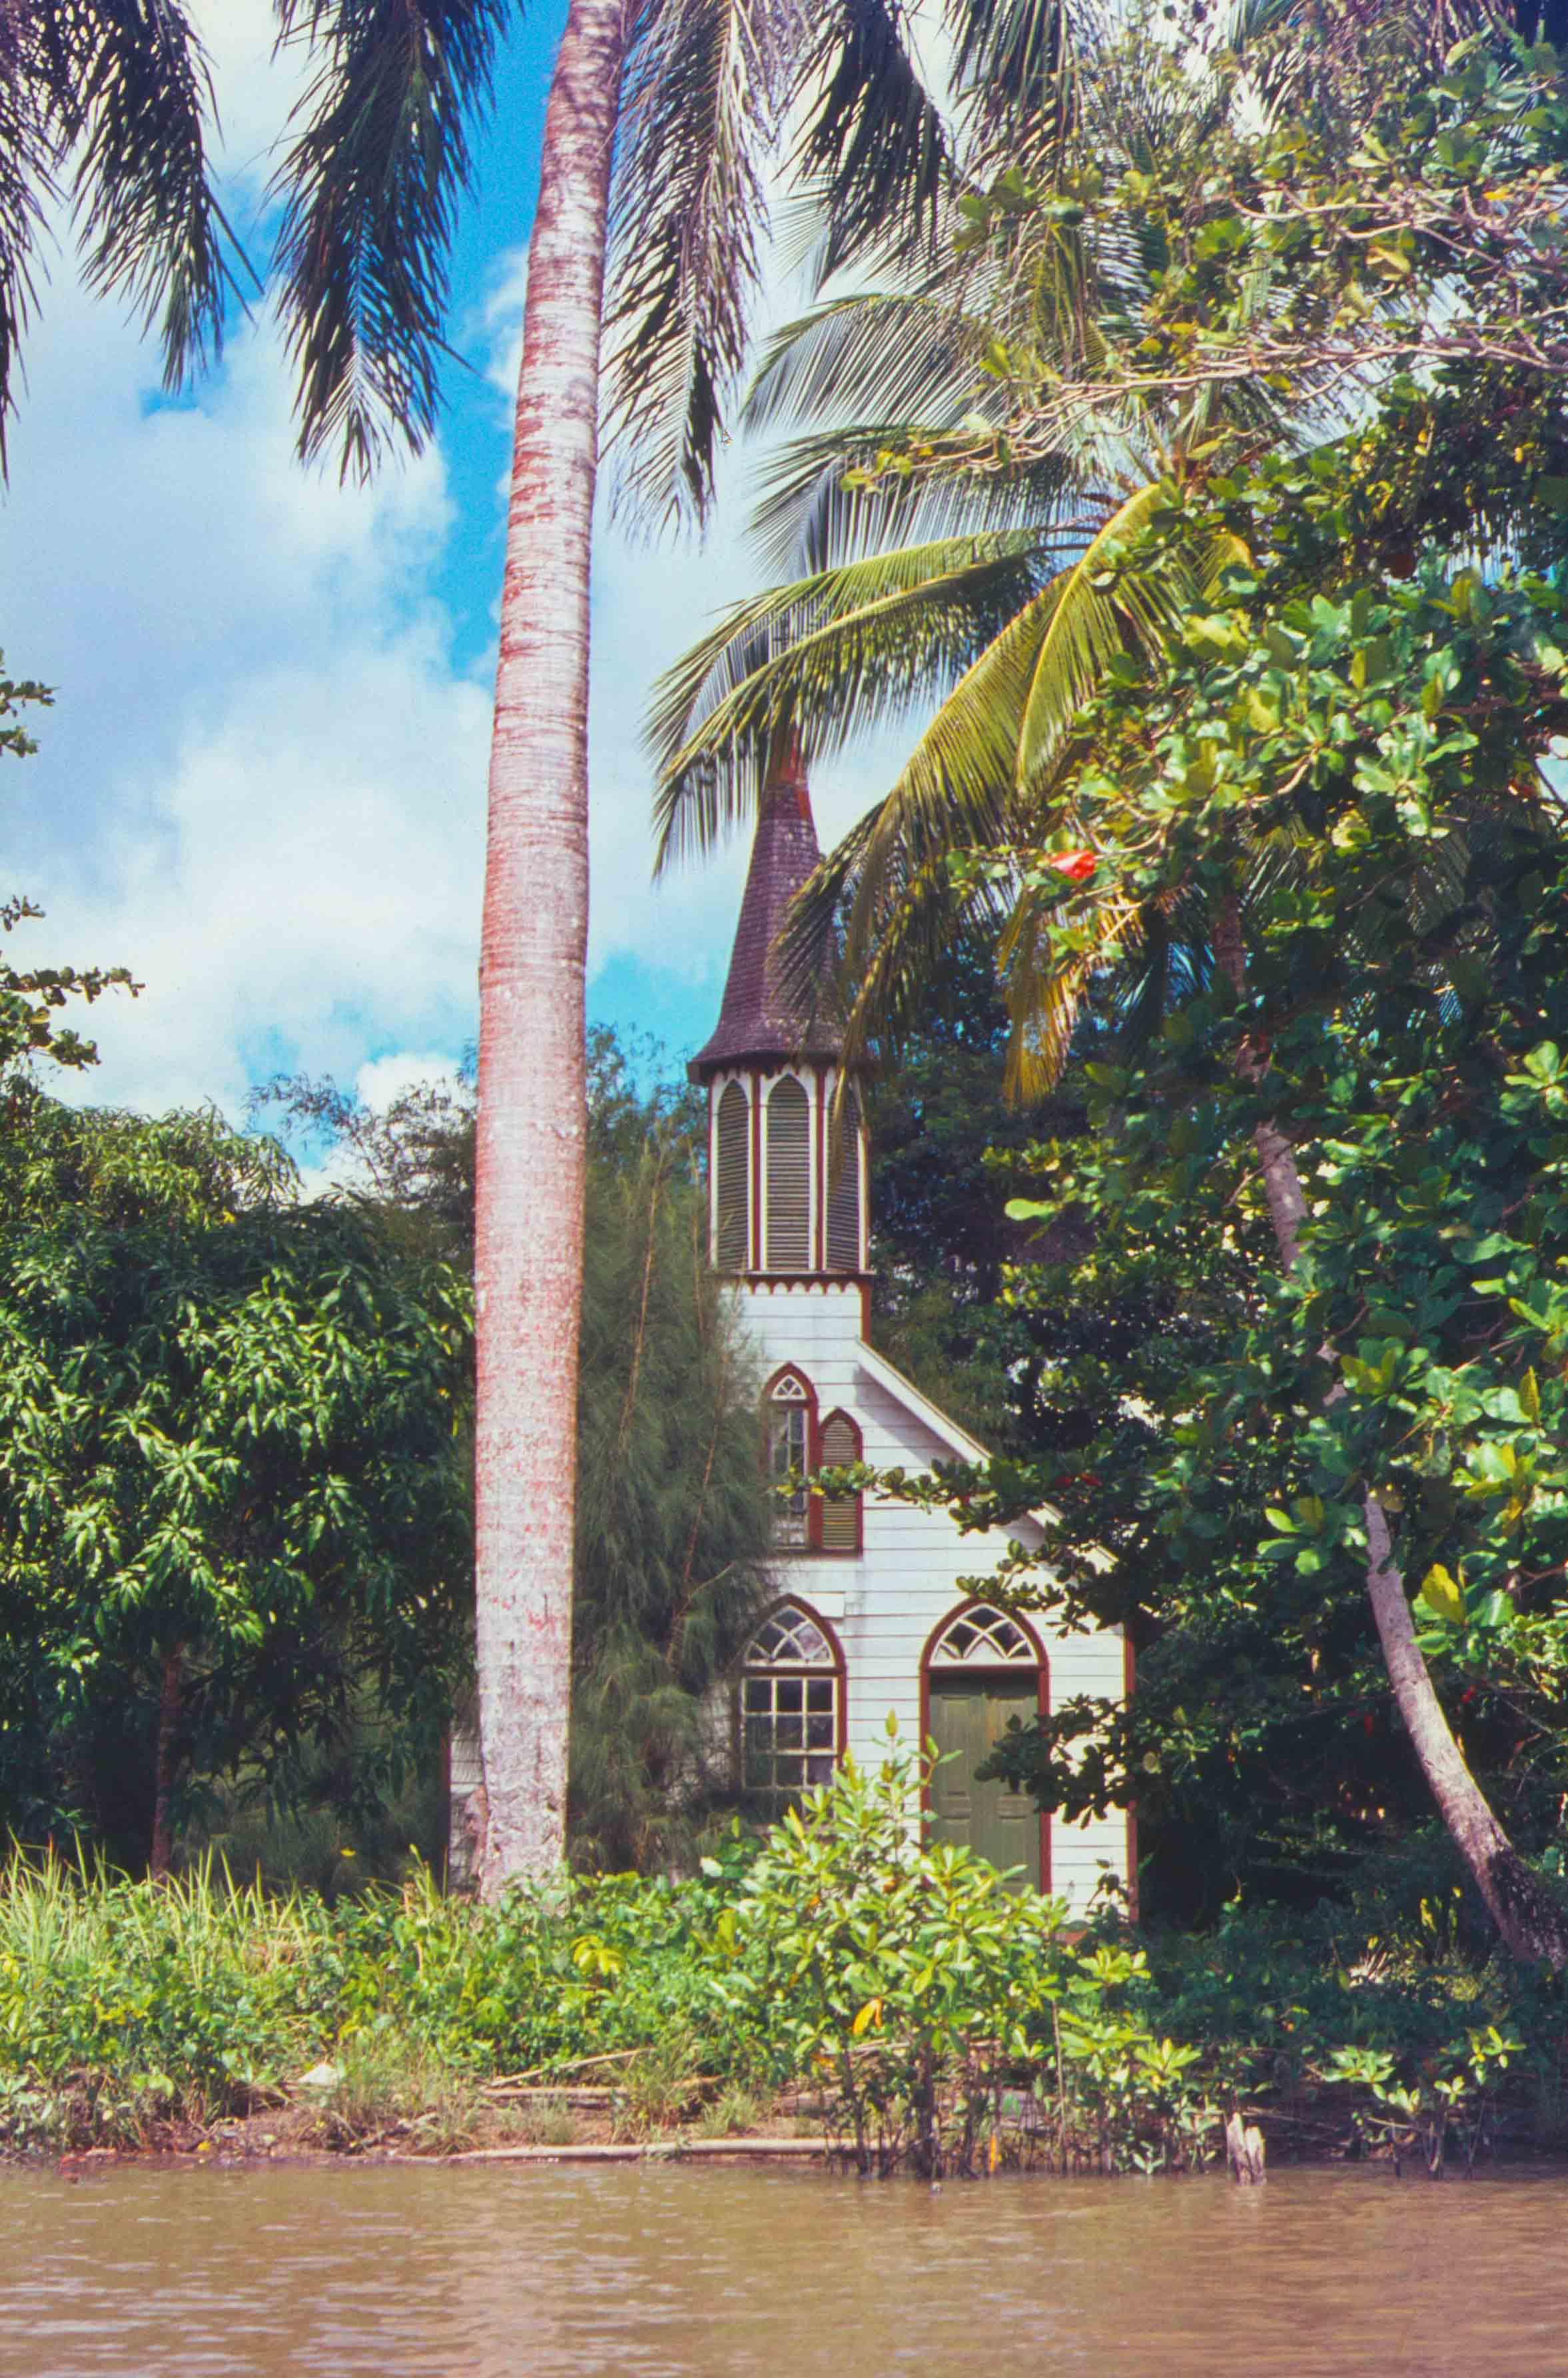 546. Suriname